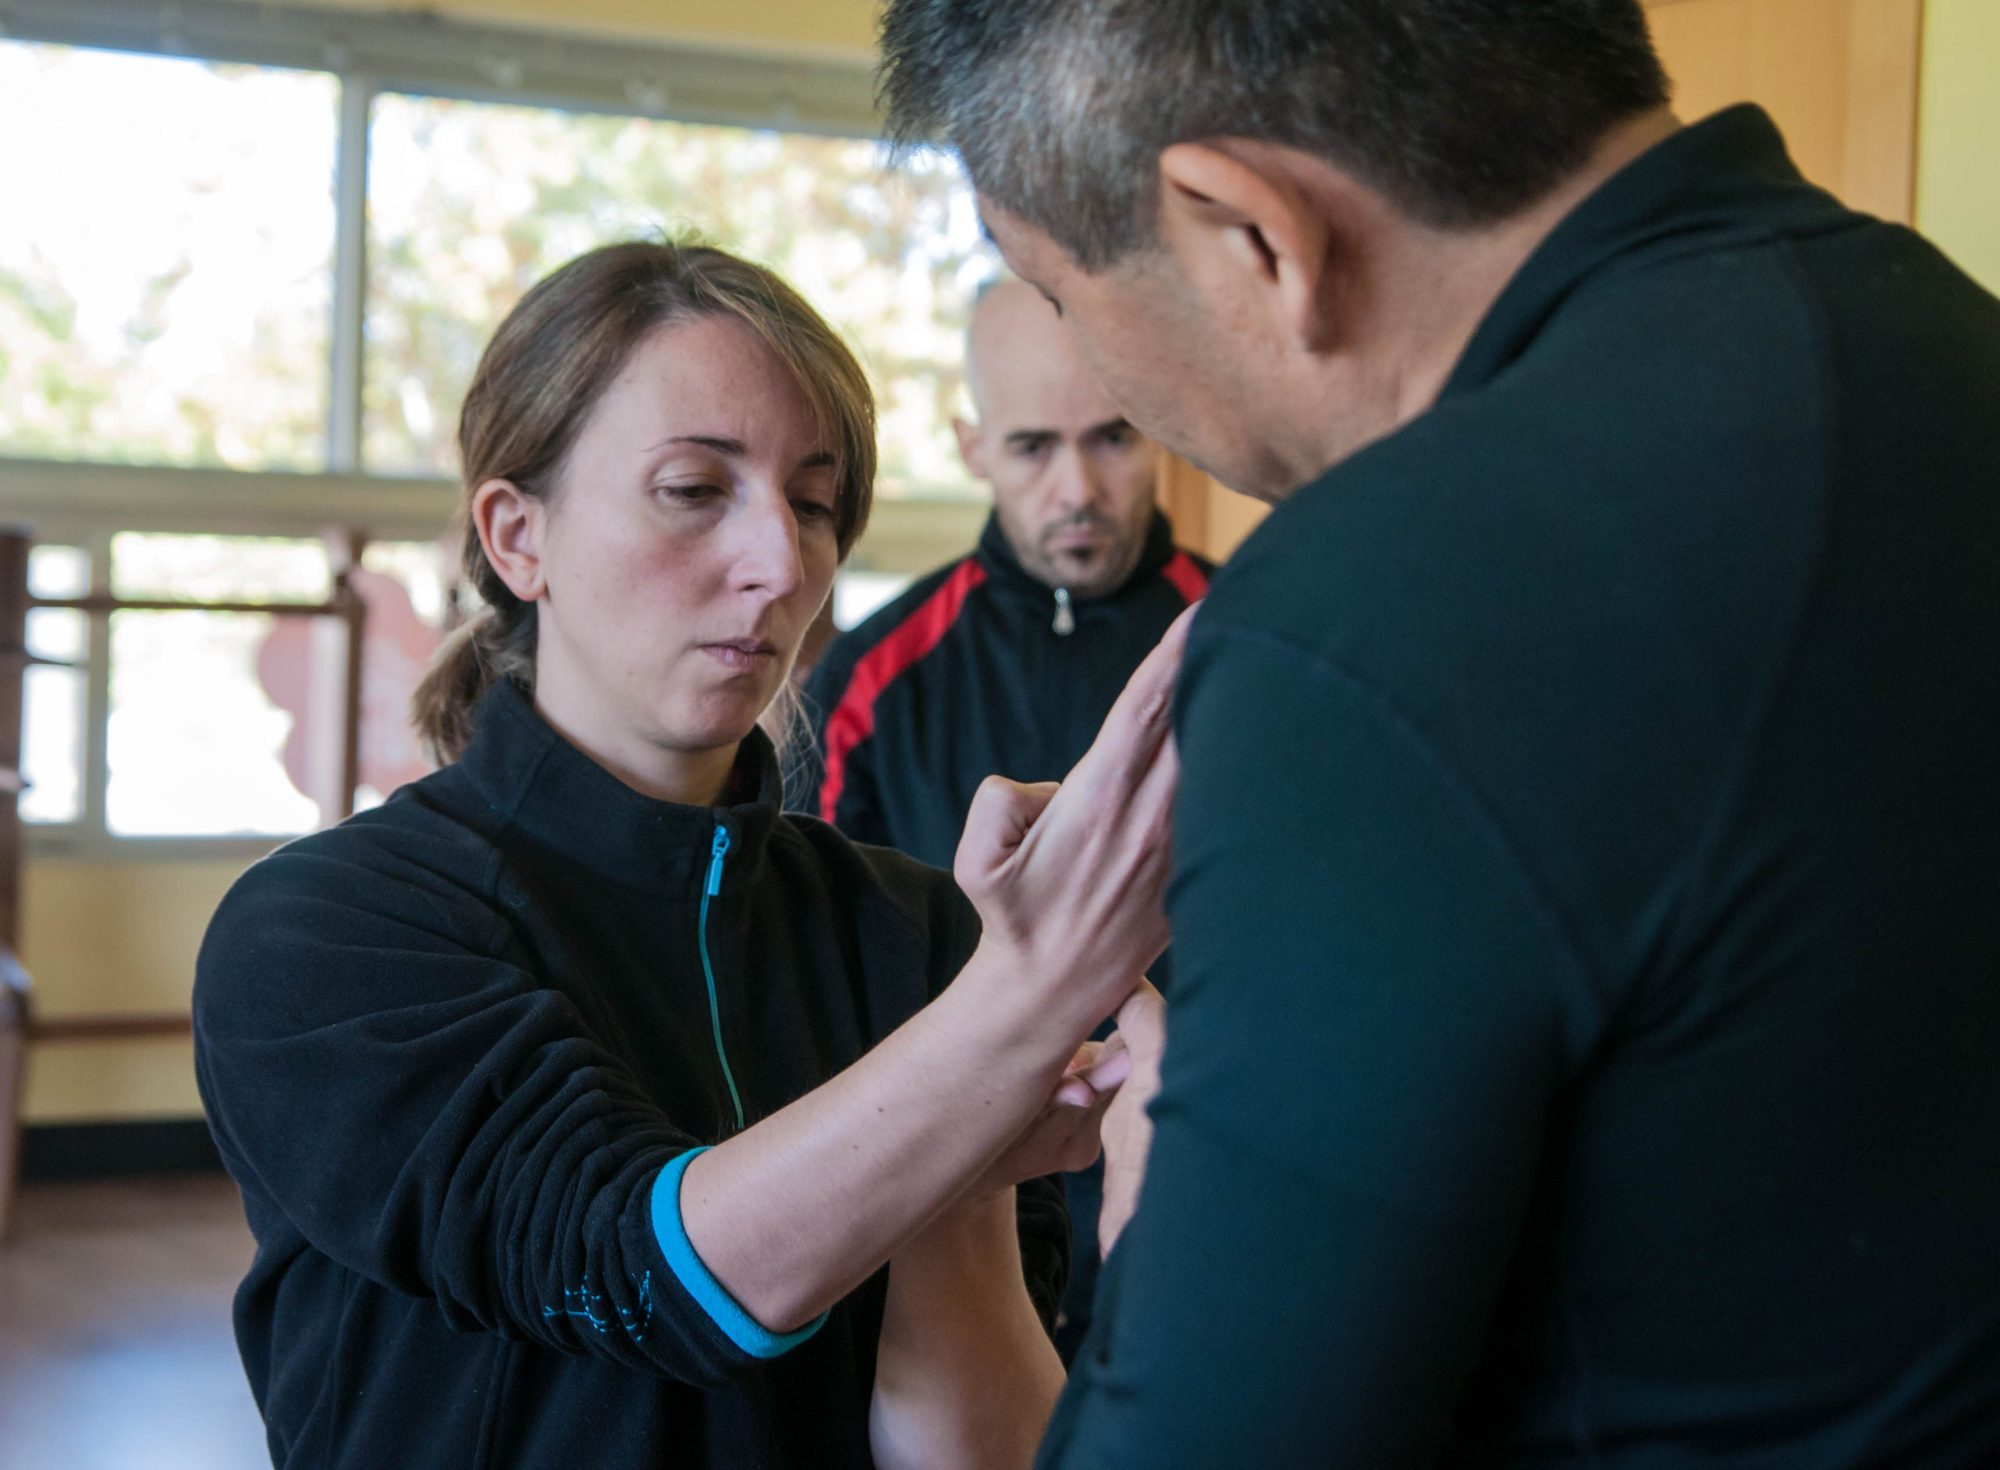 Clases de Wing Chun para mujeres. Aprende defensa personal